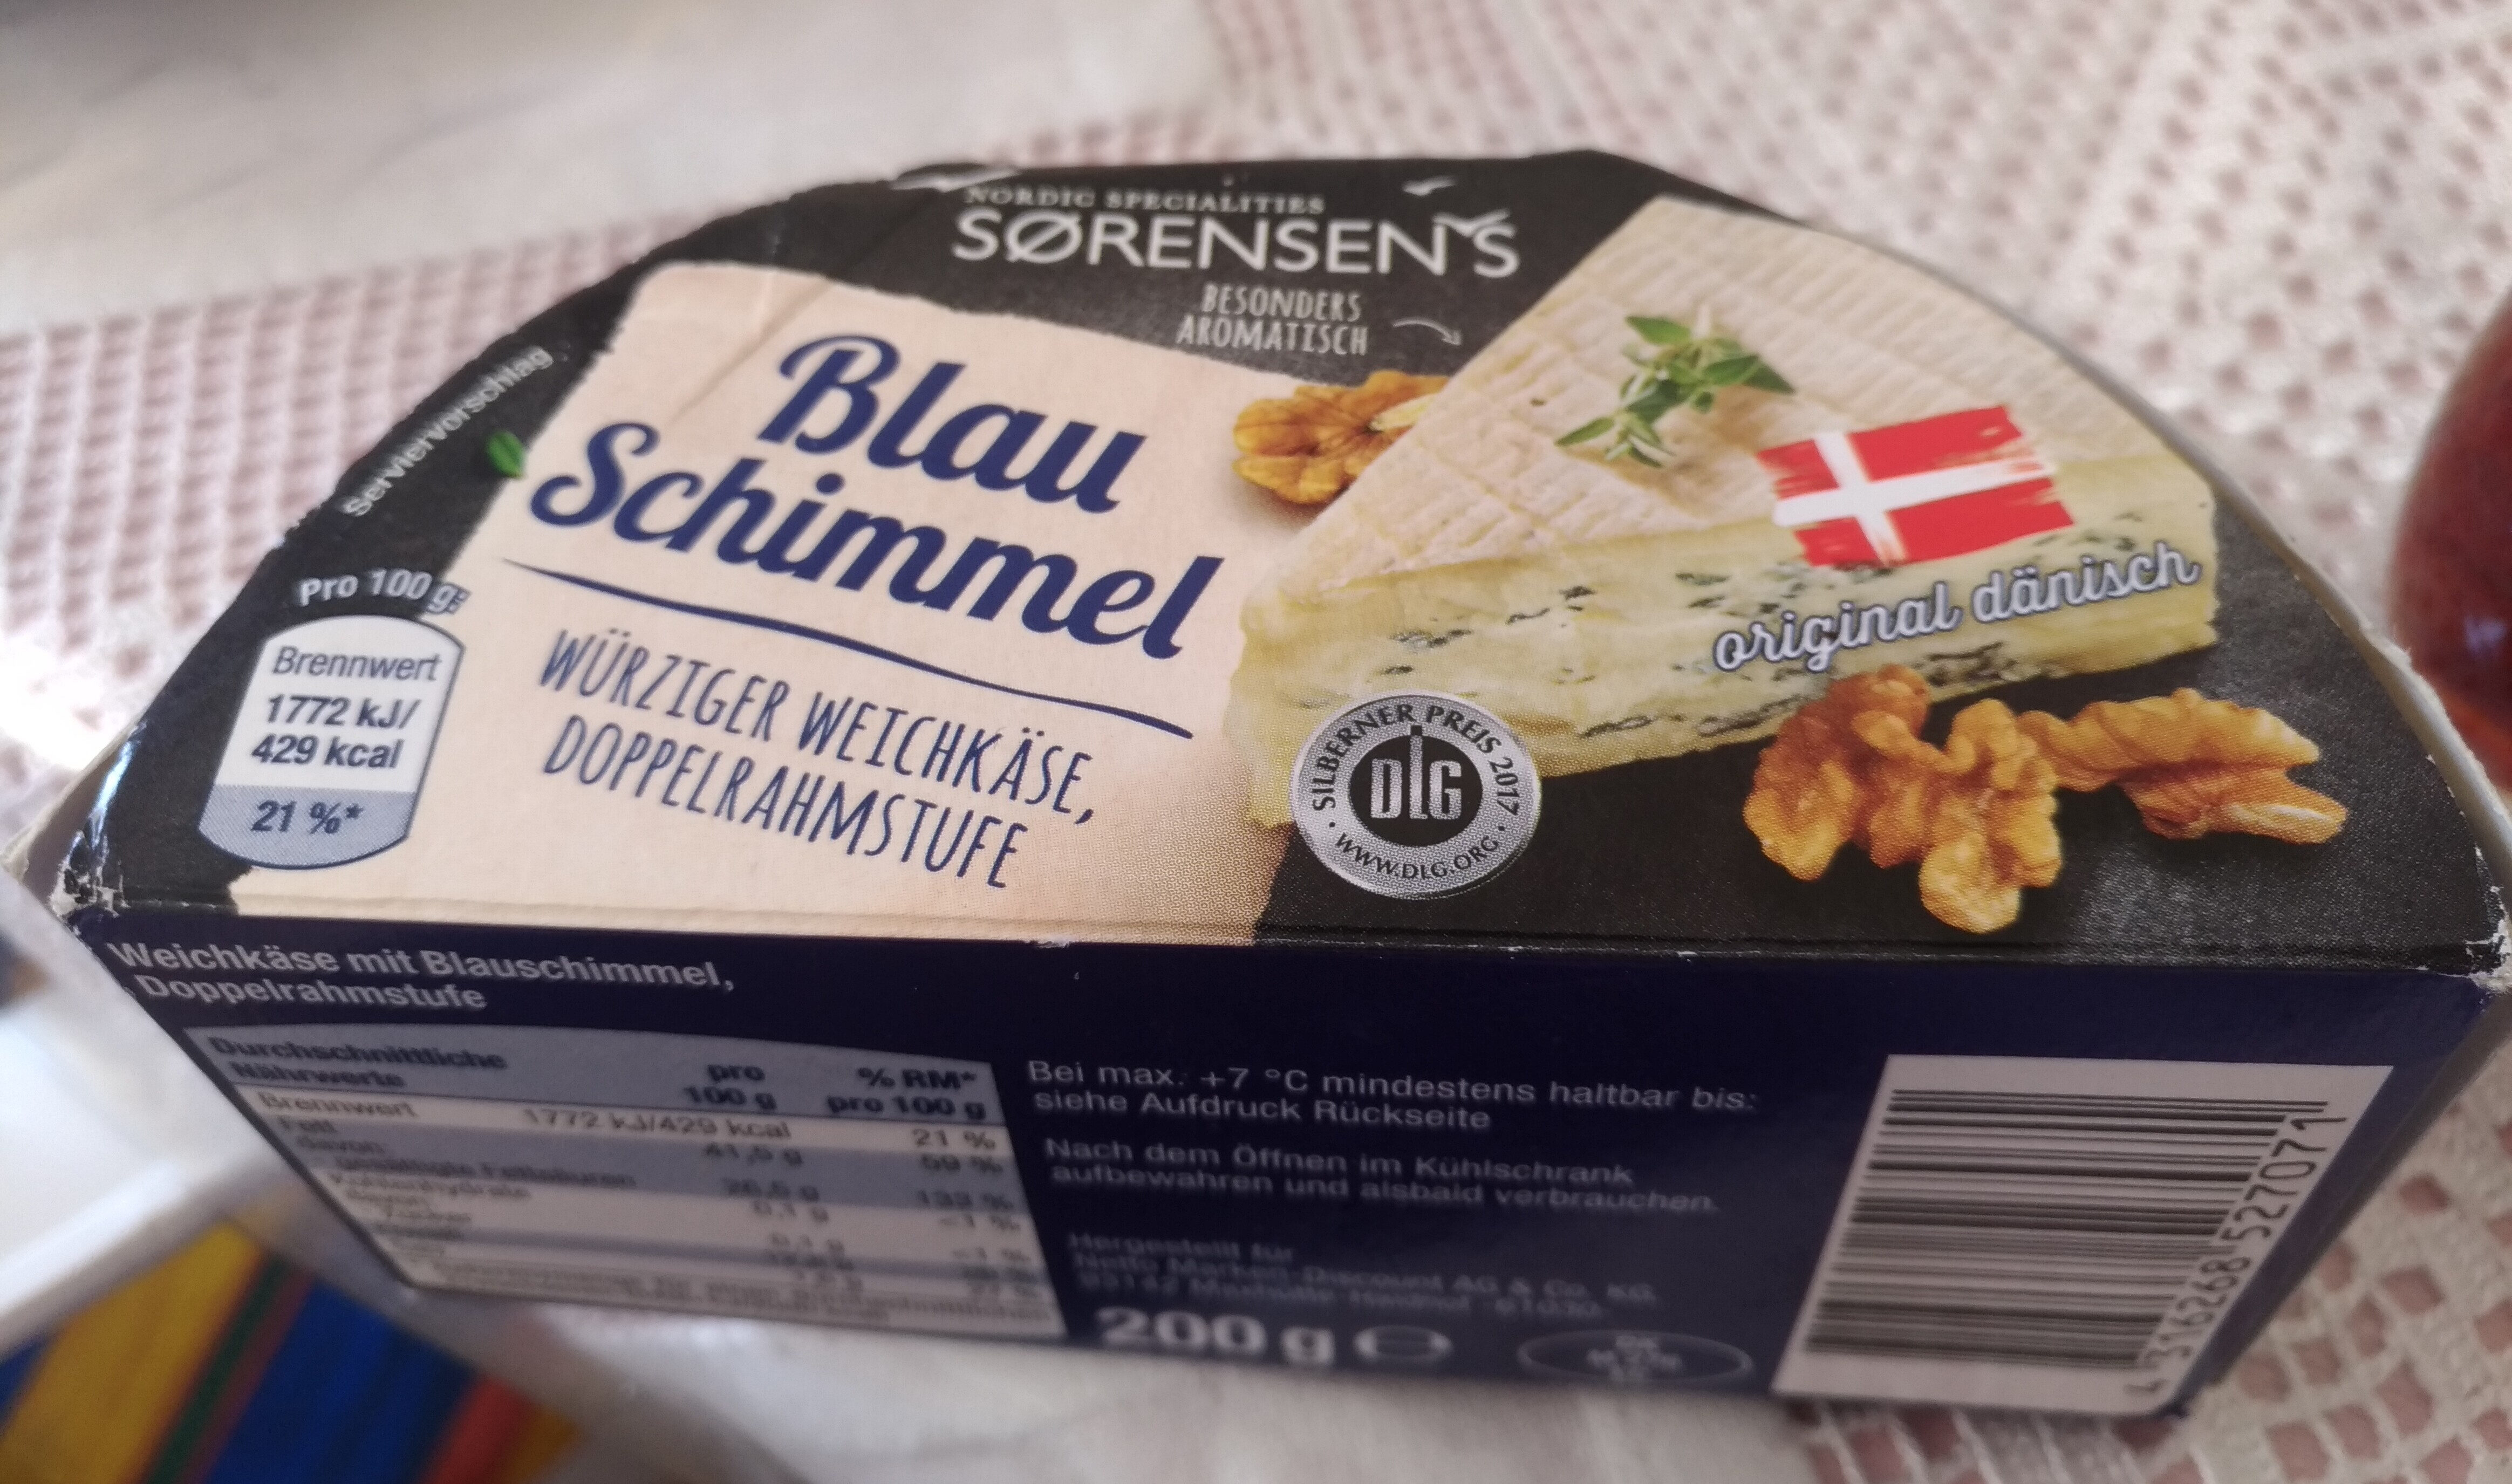 blau Schimmel Käse - Product - tr